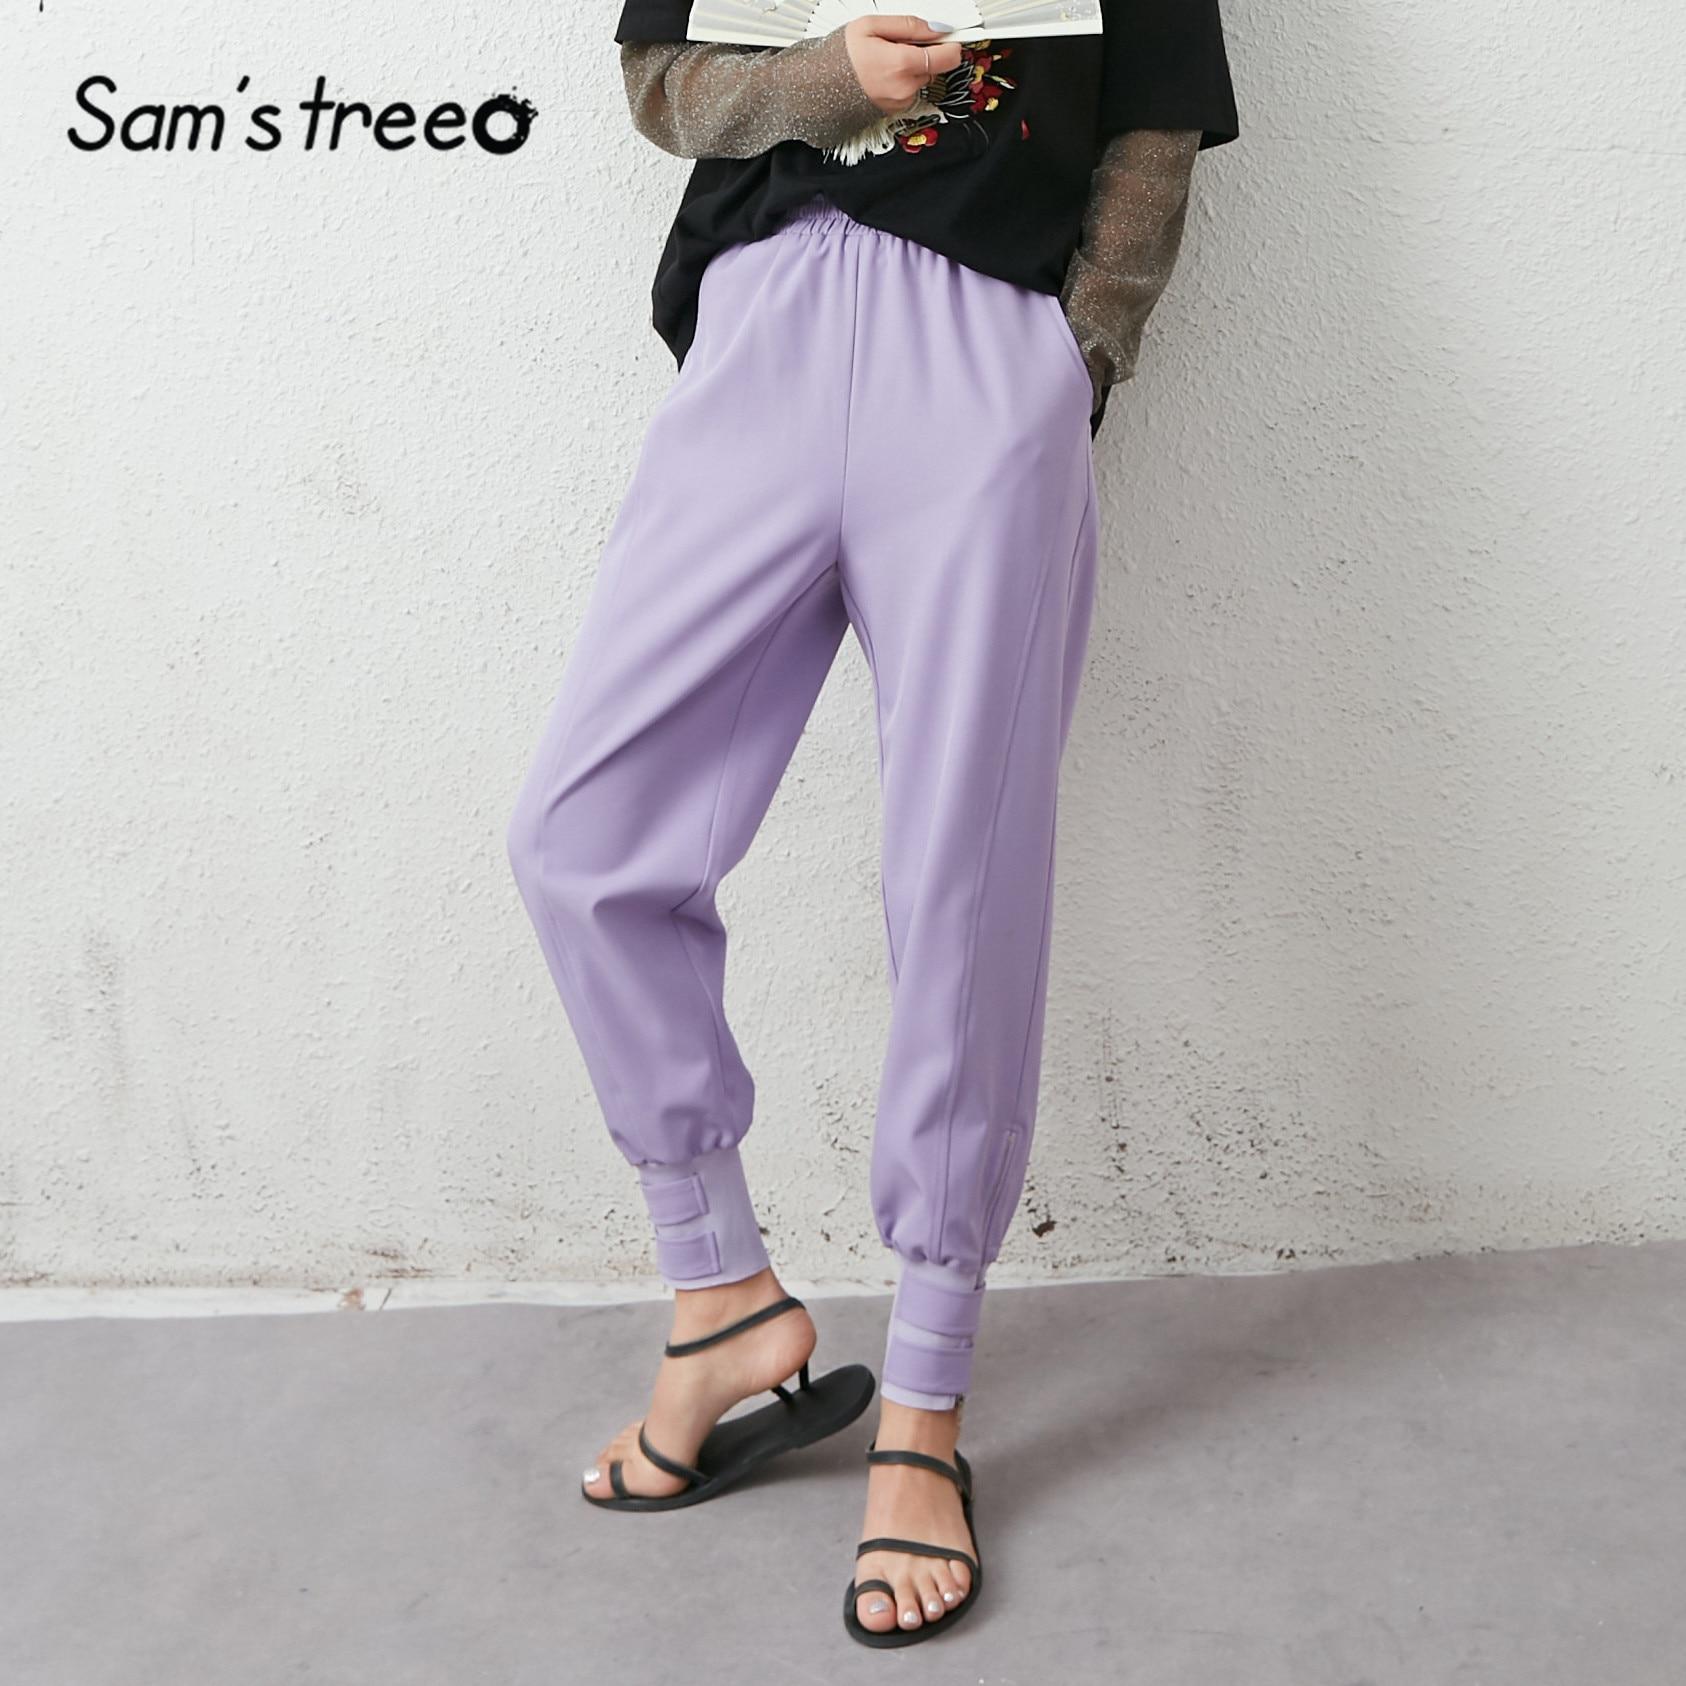 SAM'S TREE Black Solid High Waist Casual Women Pants 2020 Summer Lavender Purple Pure Lace Up Korean Ladies Daily Safari Trouser